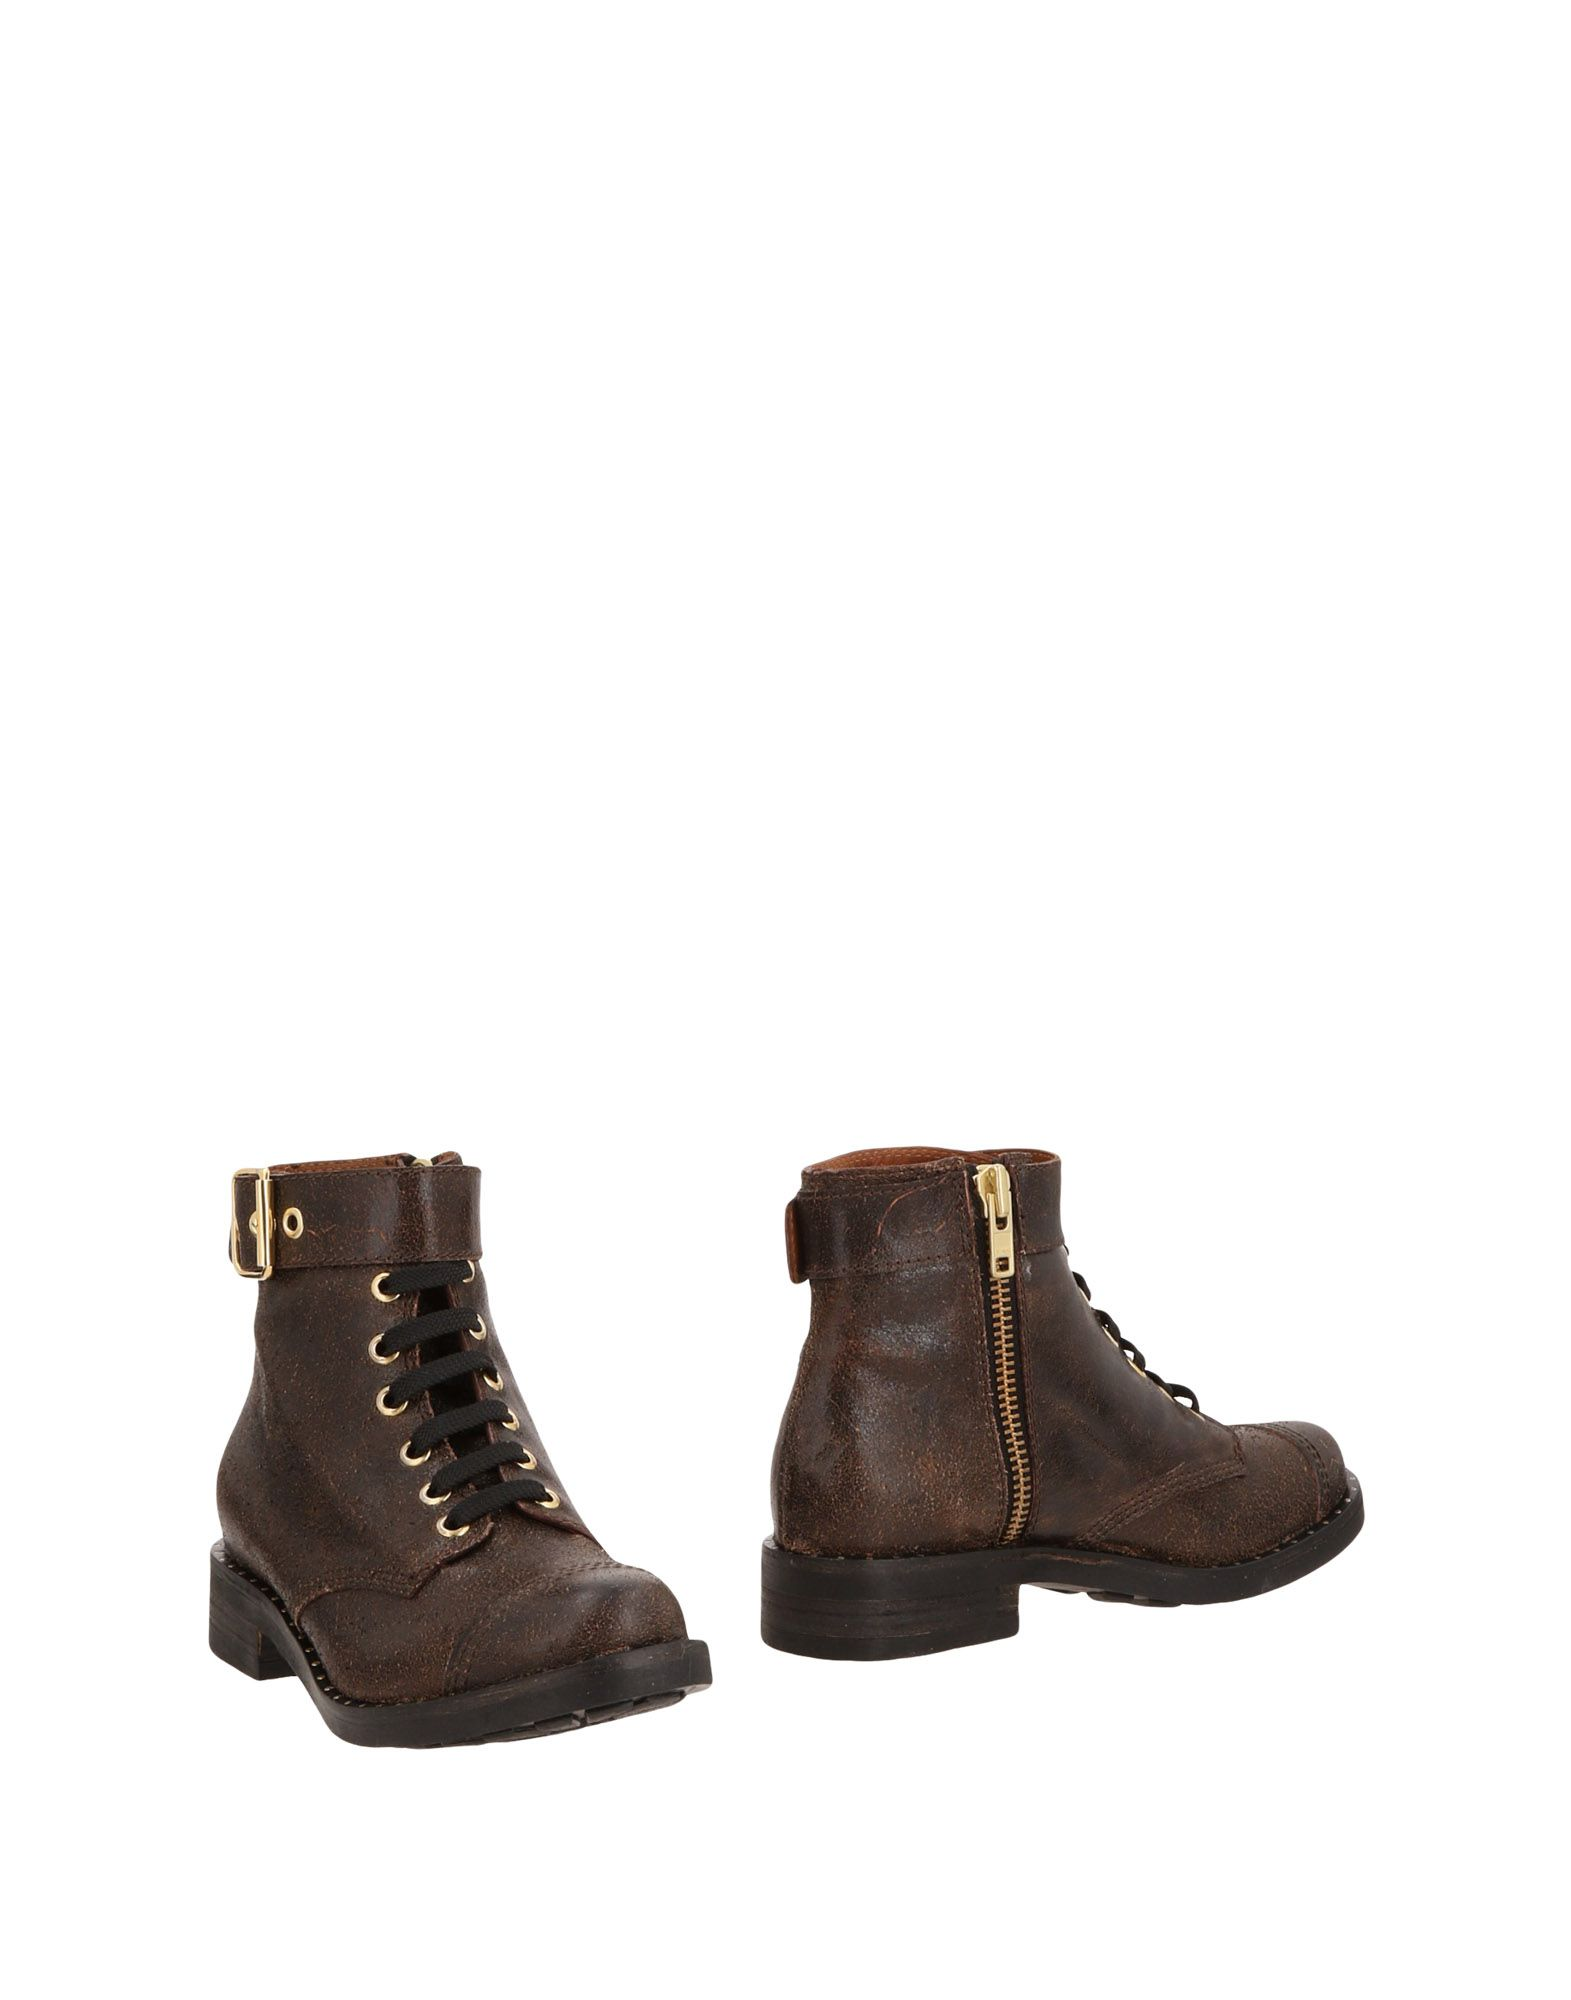 Gut um Stiefelette billige Schuhe zu tragenGrandinetti Stiefelette um Damen  11460763MX cce1da